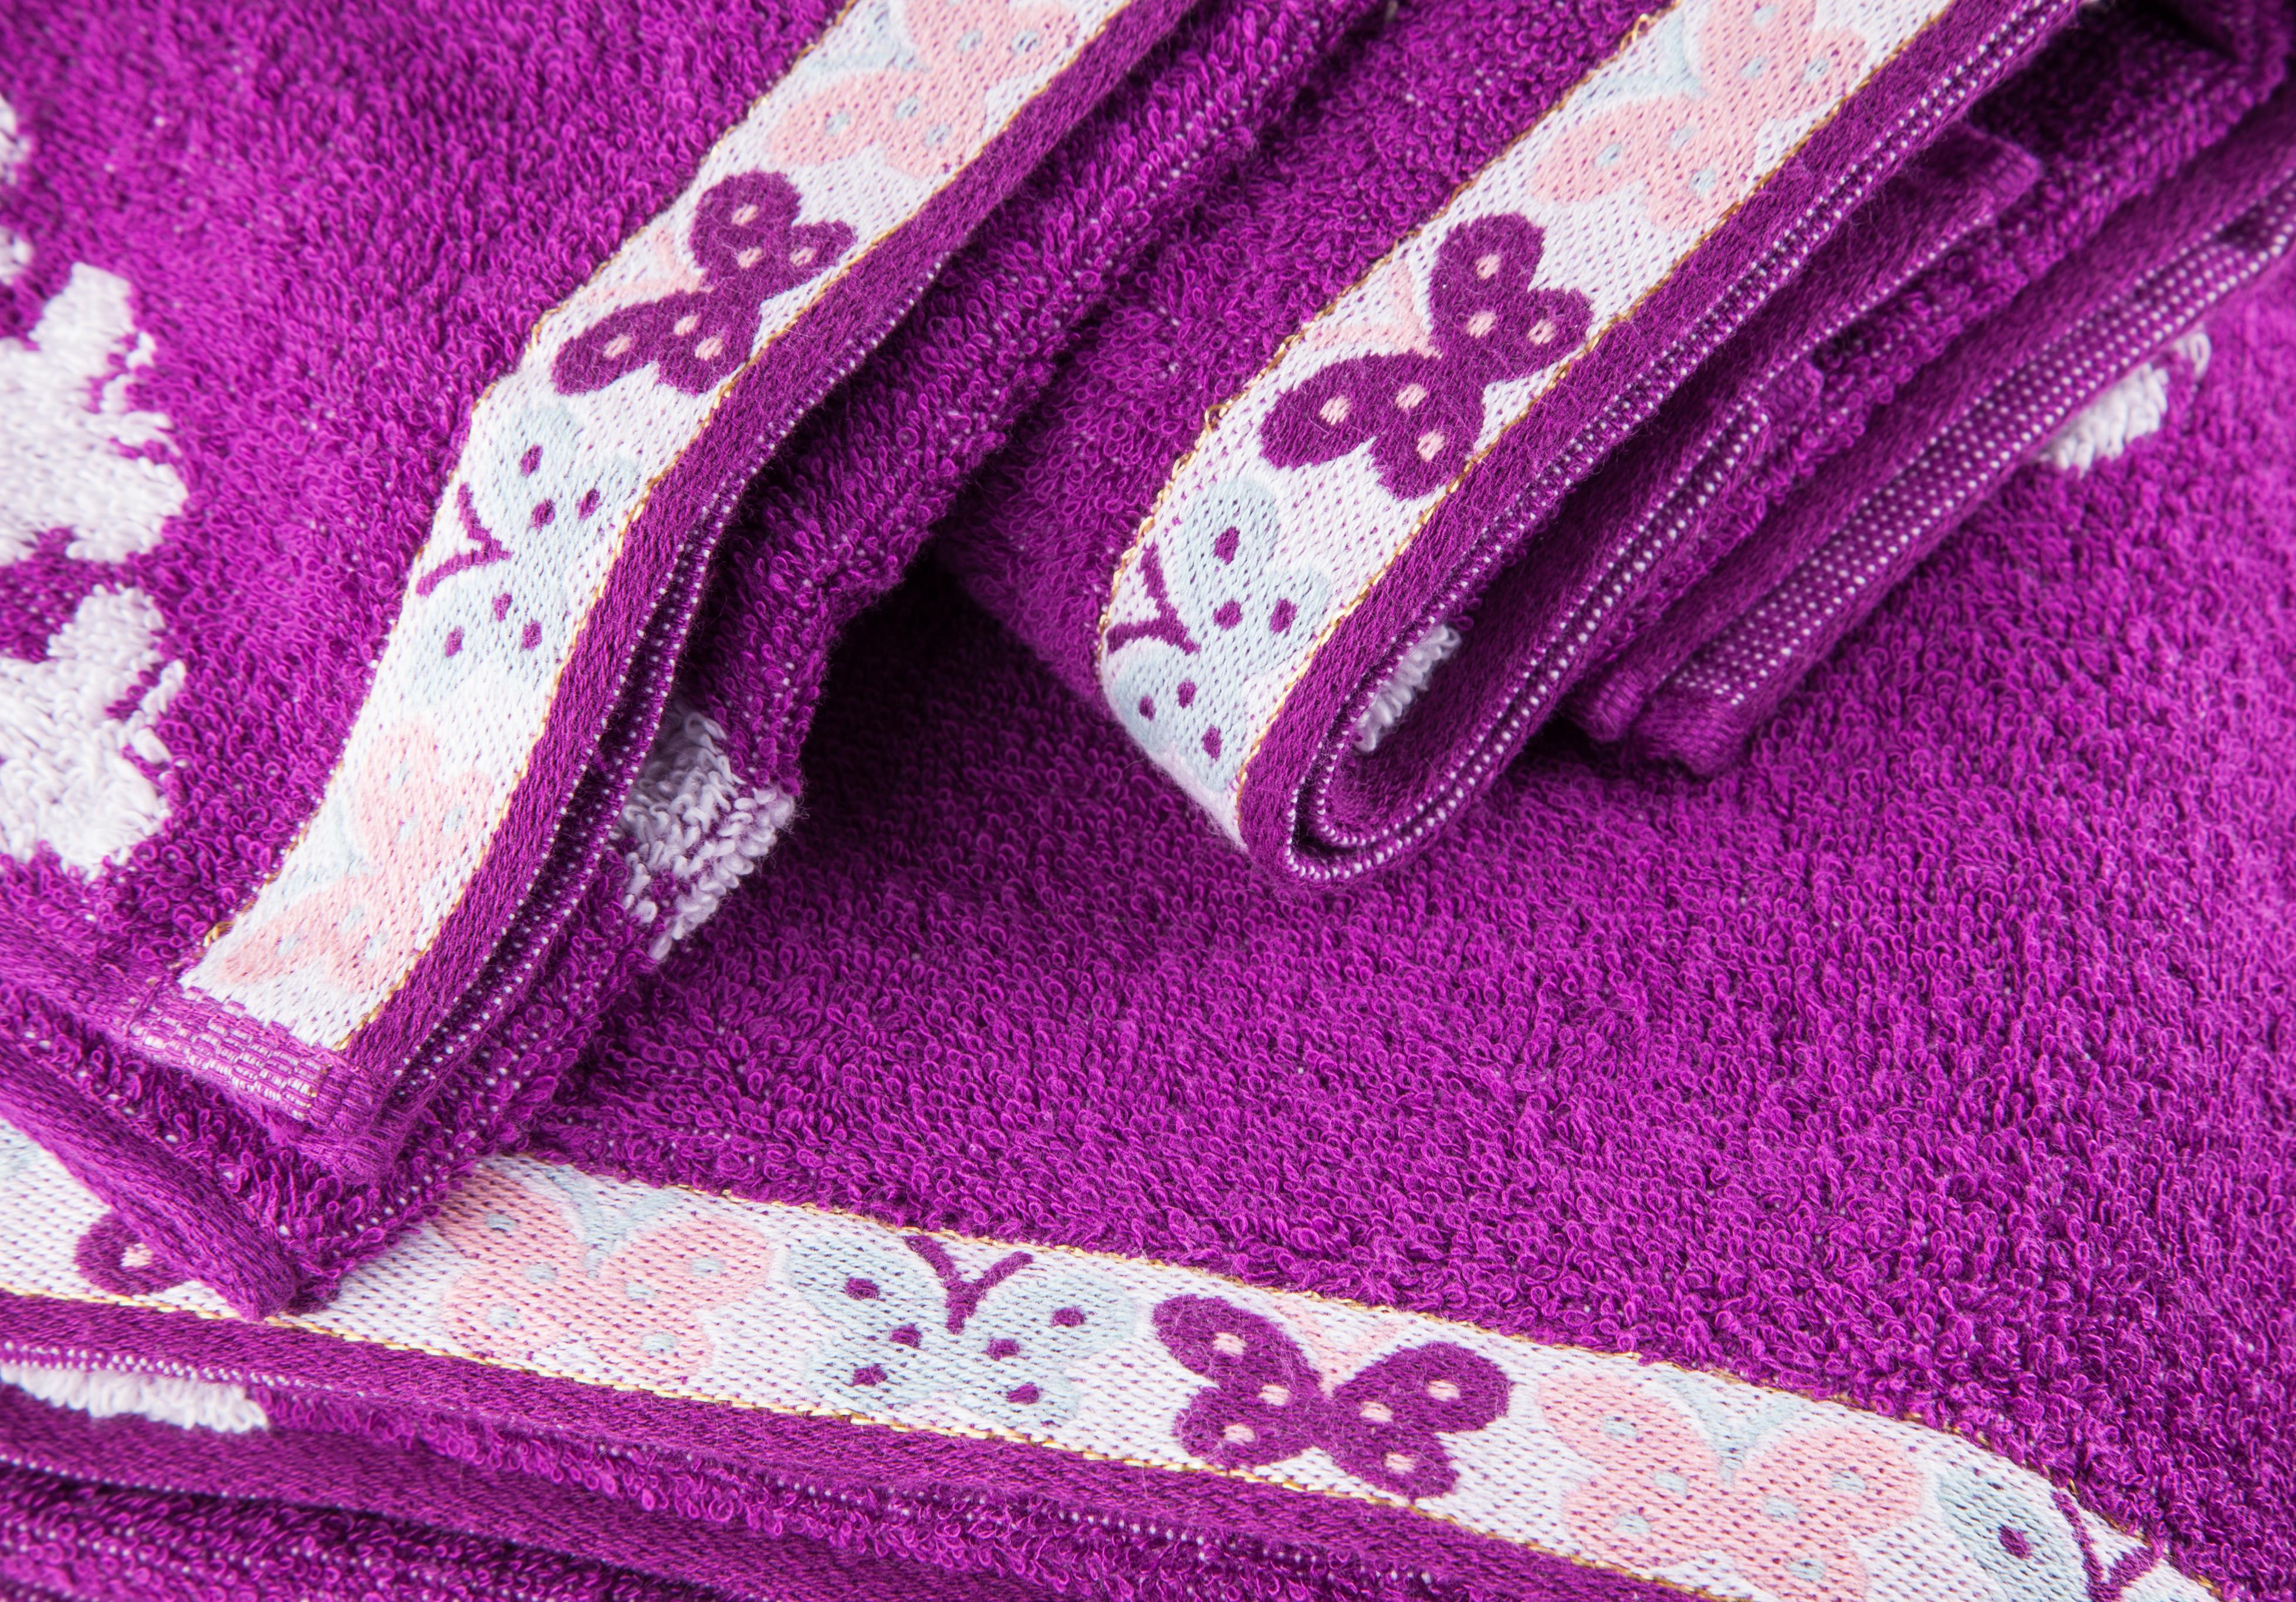 Woven border towel.